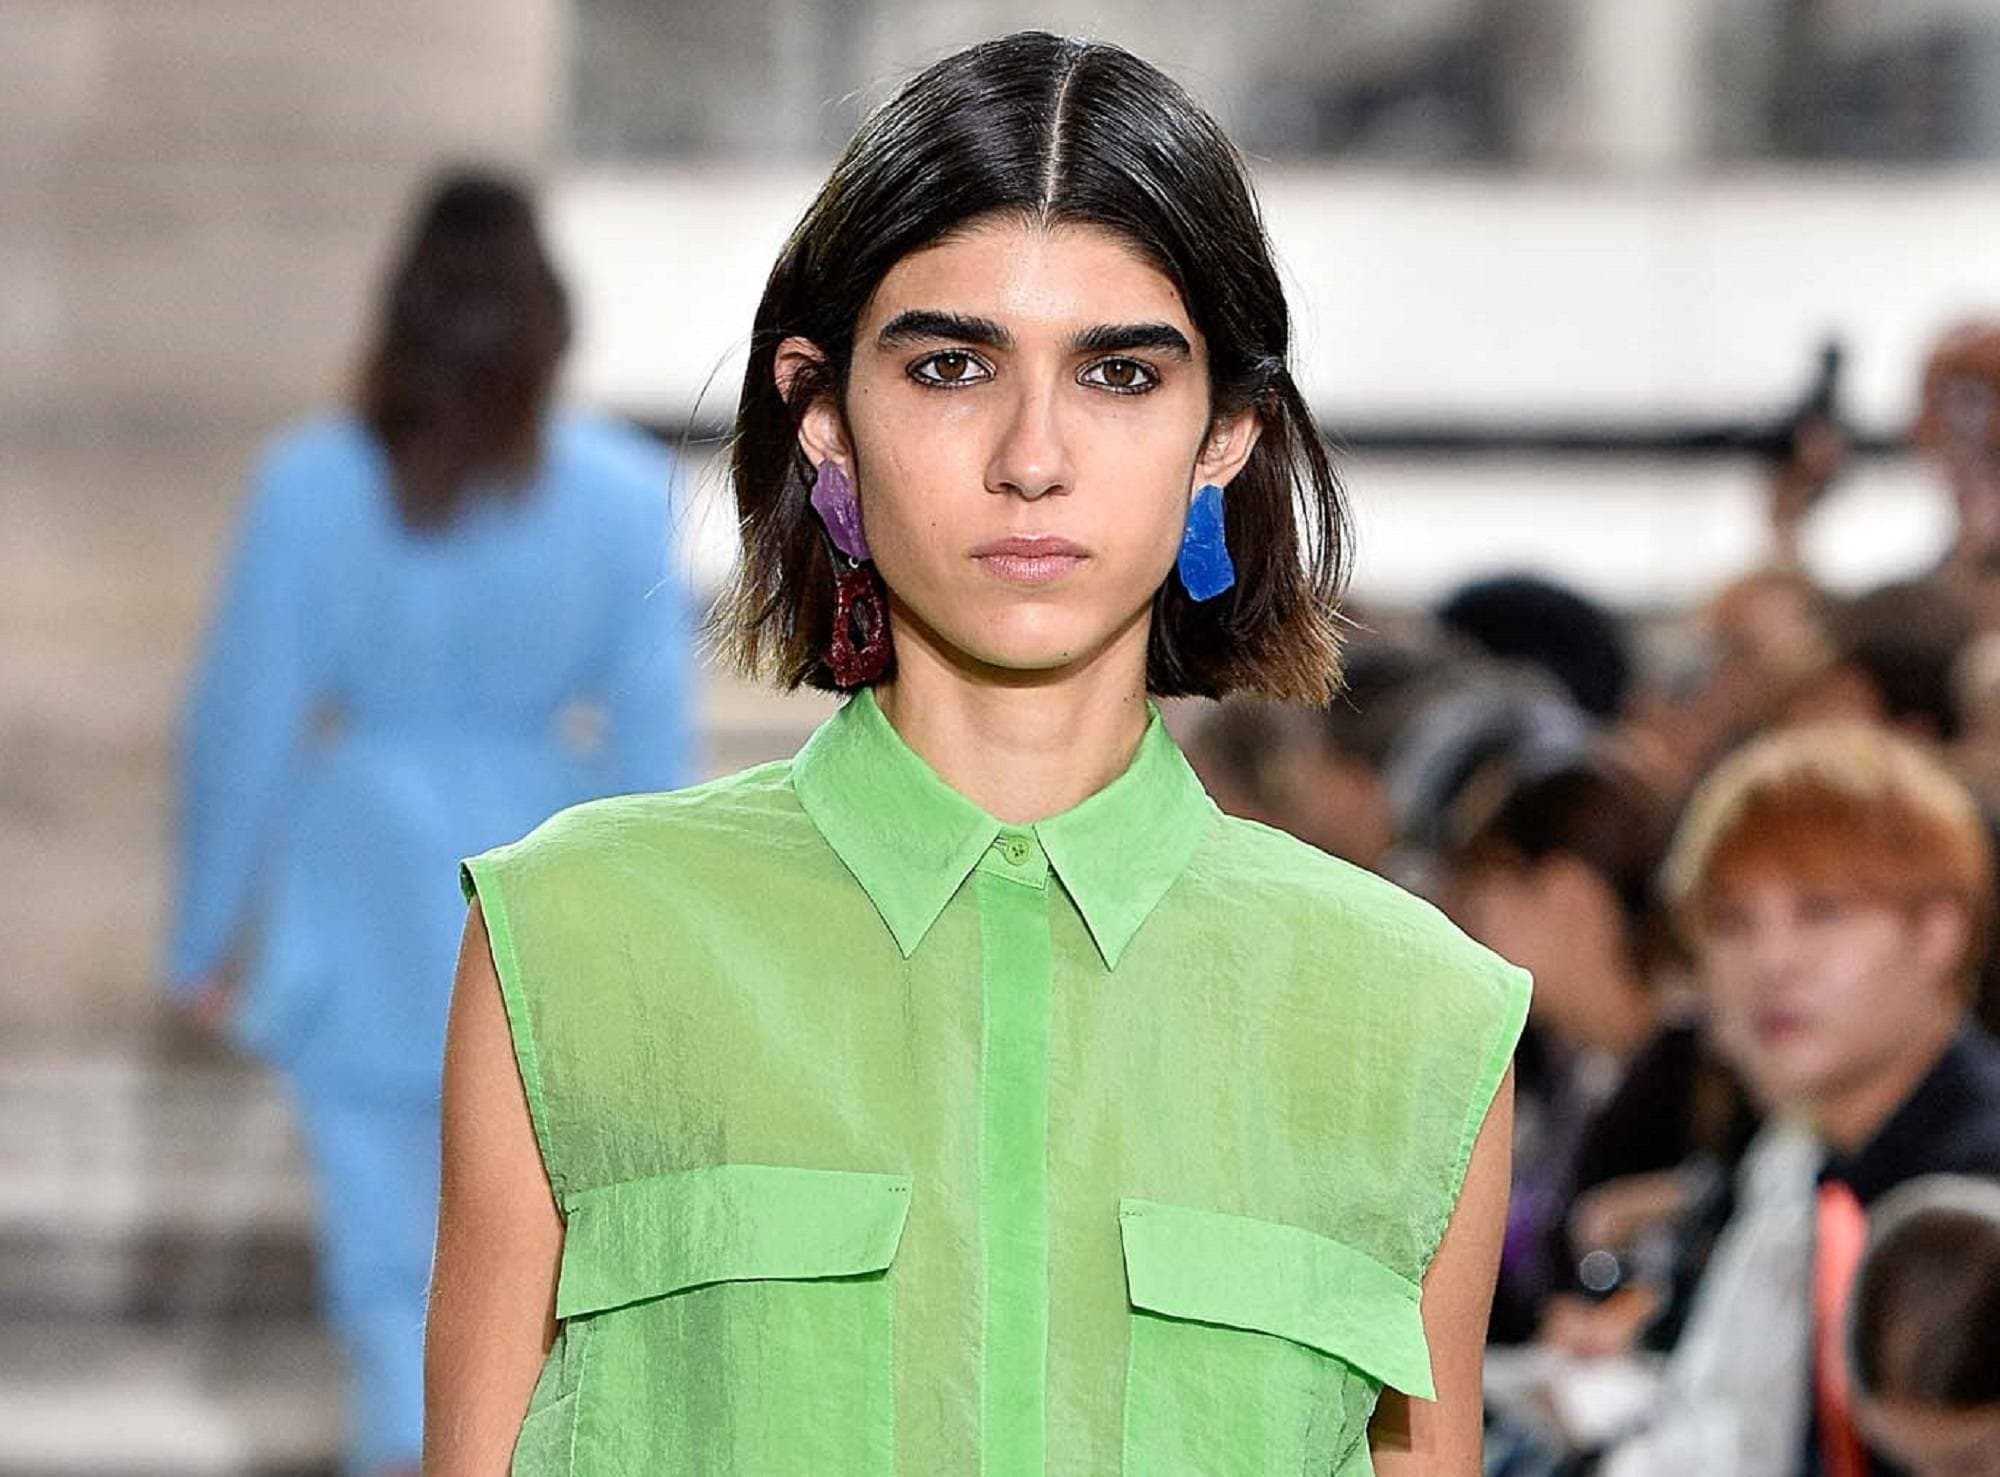 Medium bob: Closeup shot of woman wearing a green blouse with black blunt bob in a fashion show